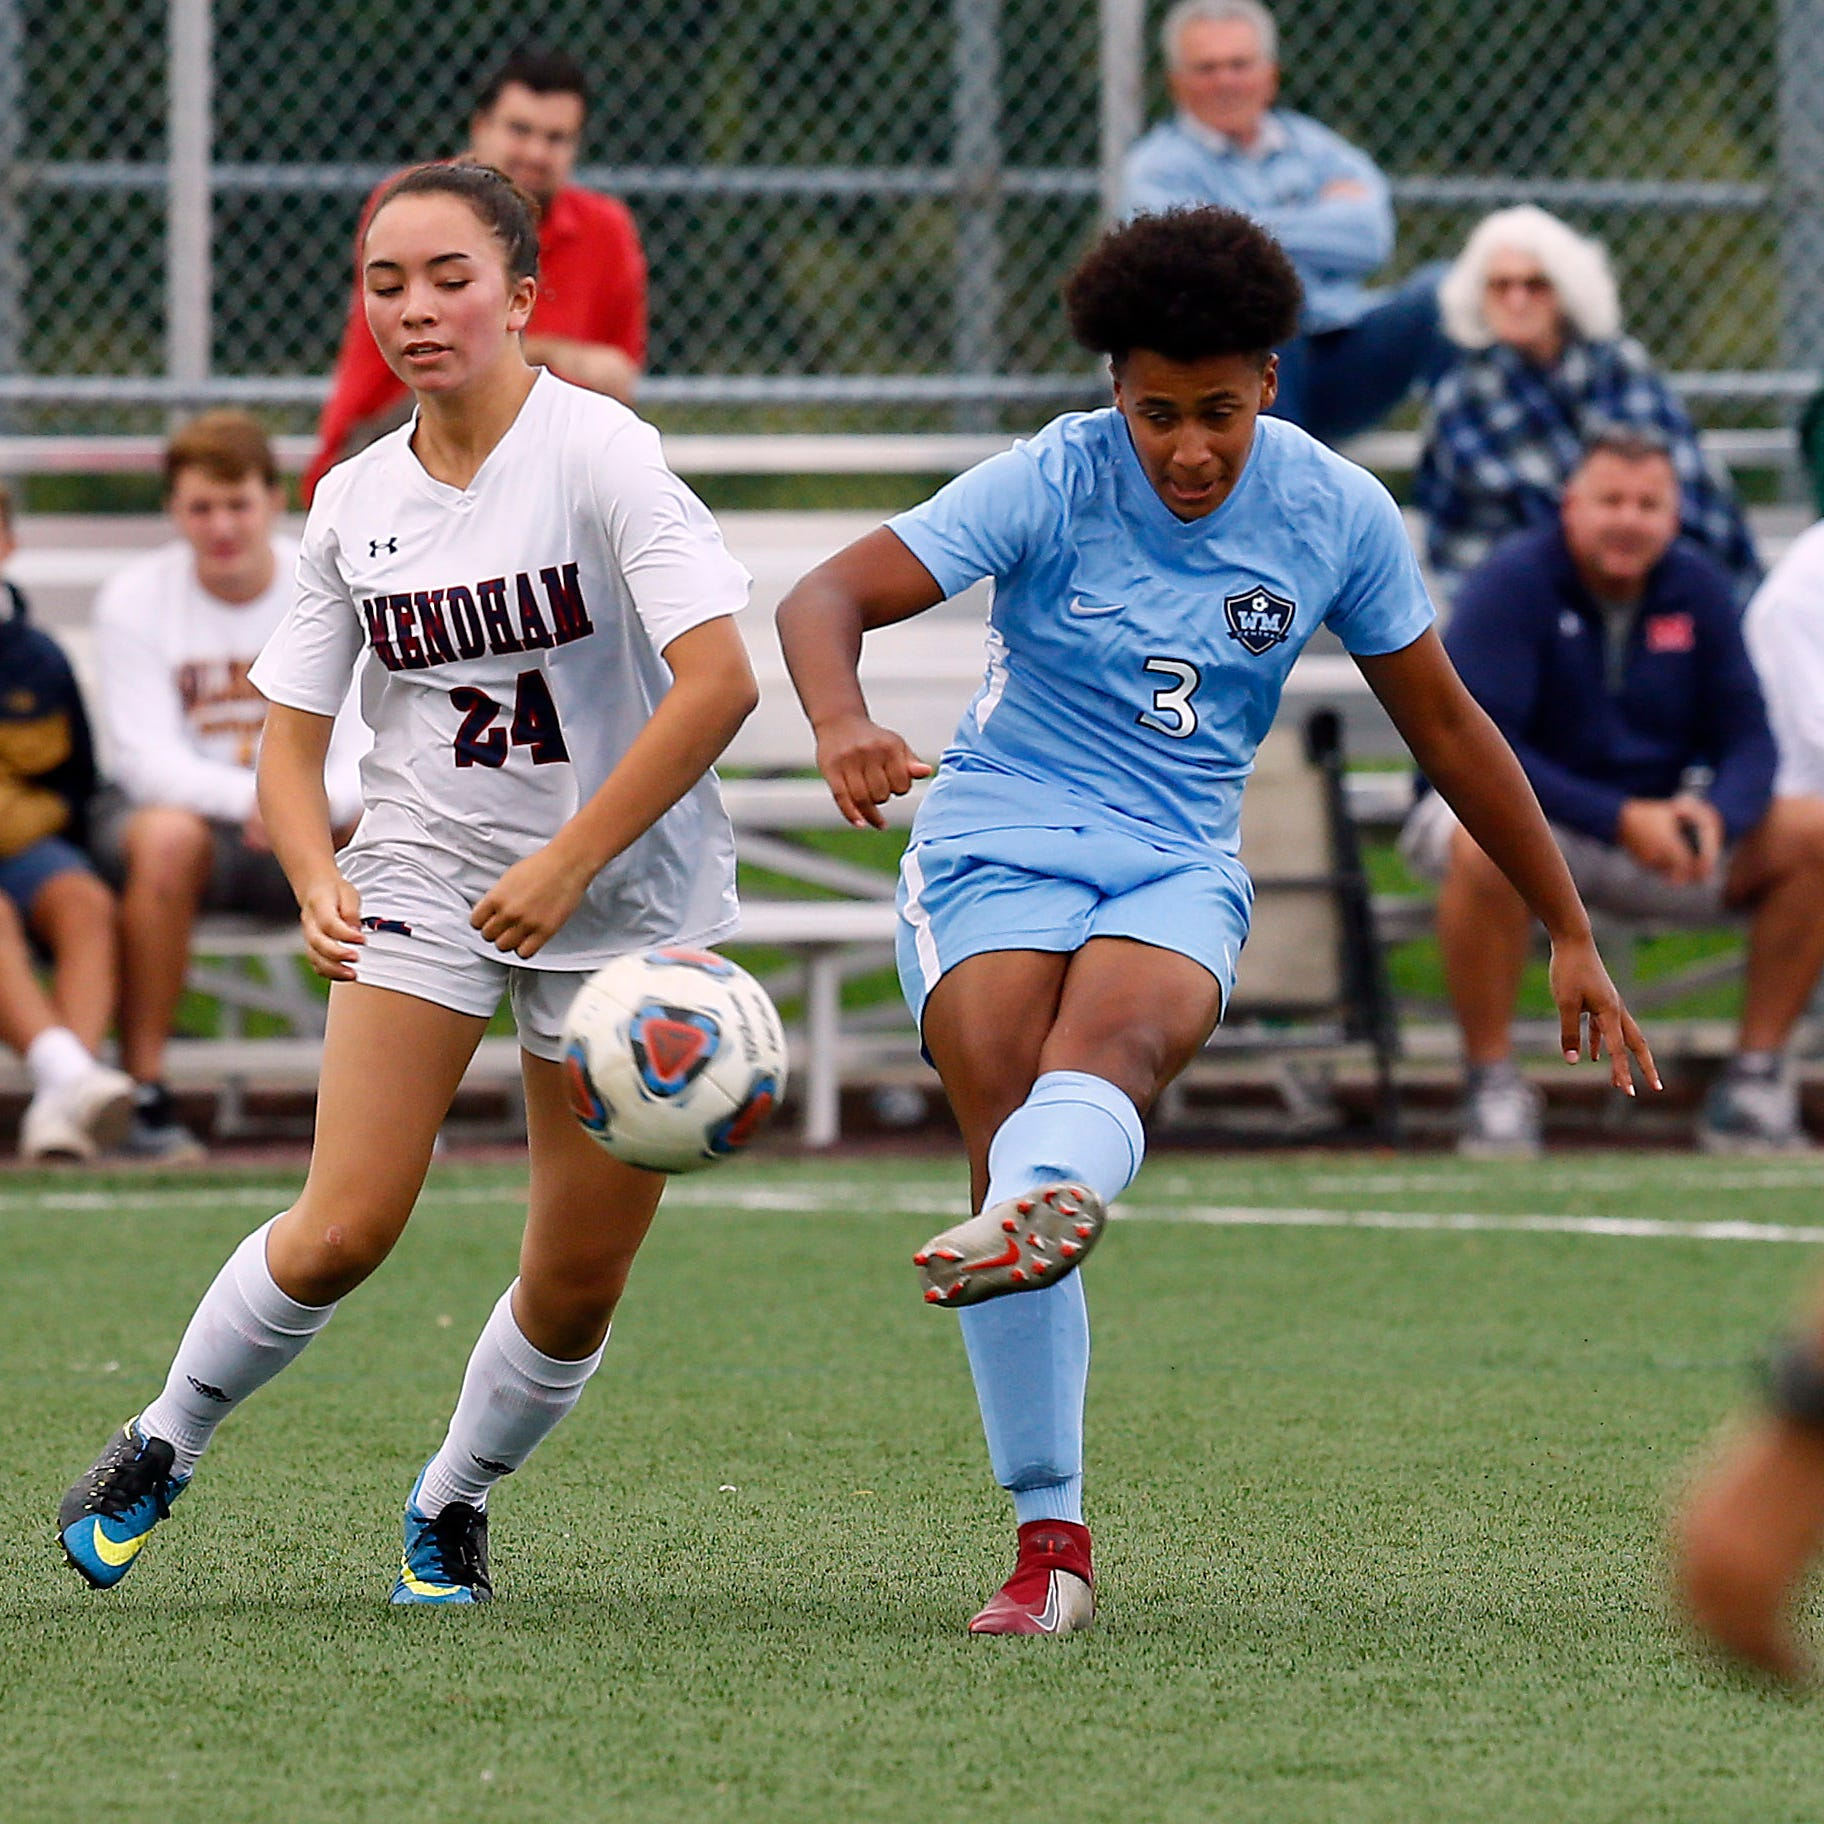 PHOTOS: Mendham vs. West Morris NJAC-American girls soccer match